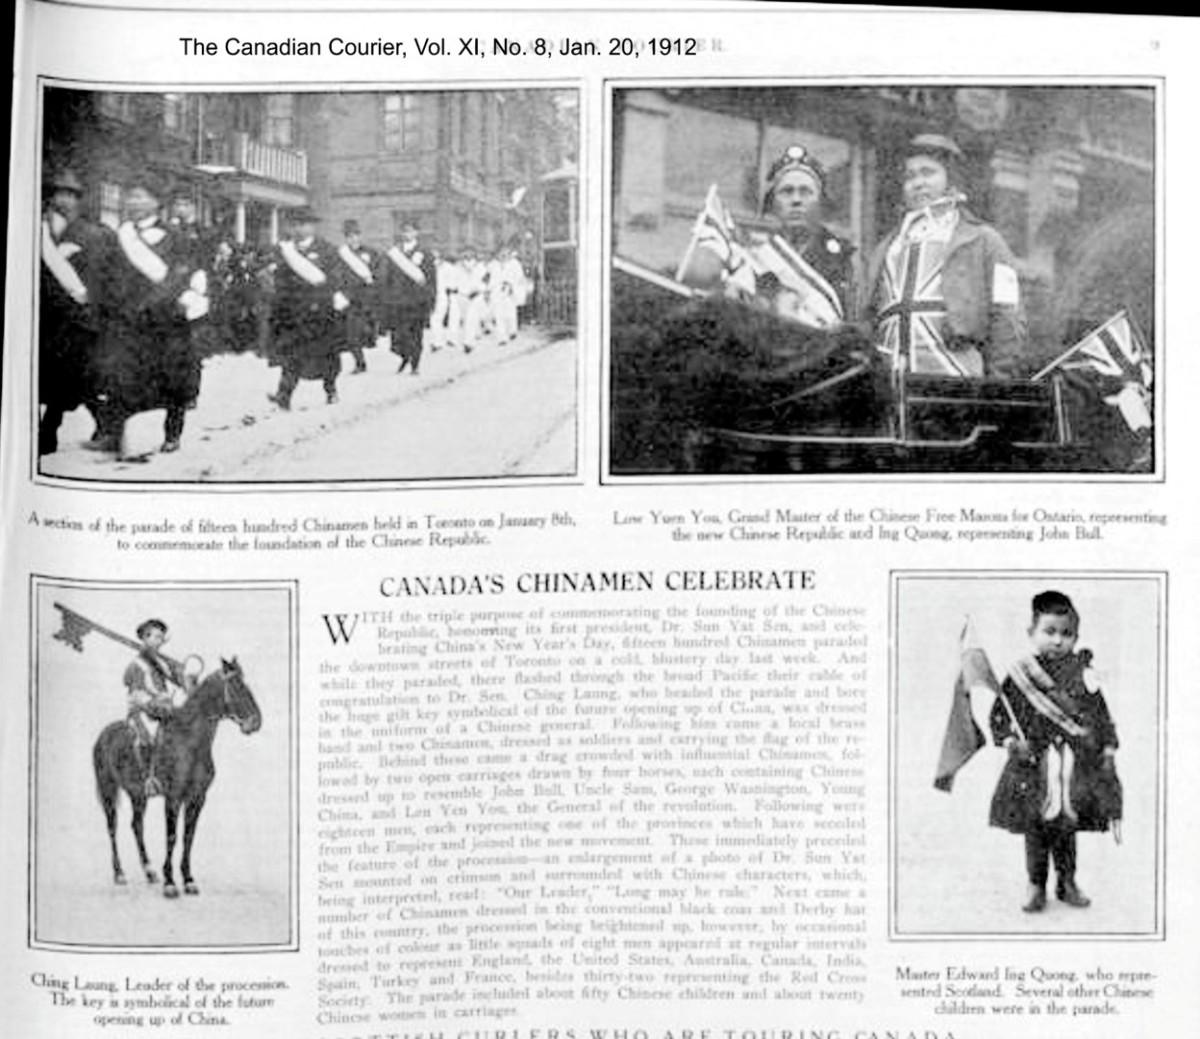 Canadian Courier, Vol. XI, No. 8, Jan. 20, 1912